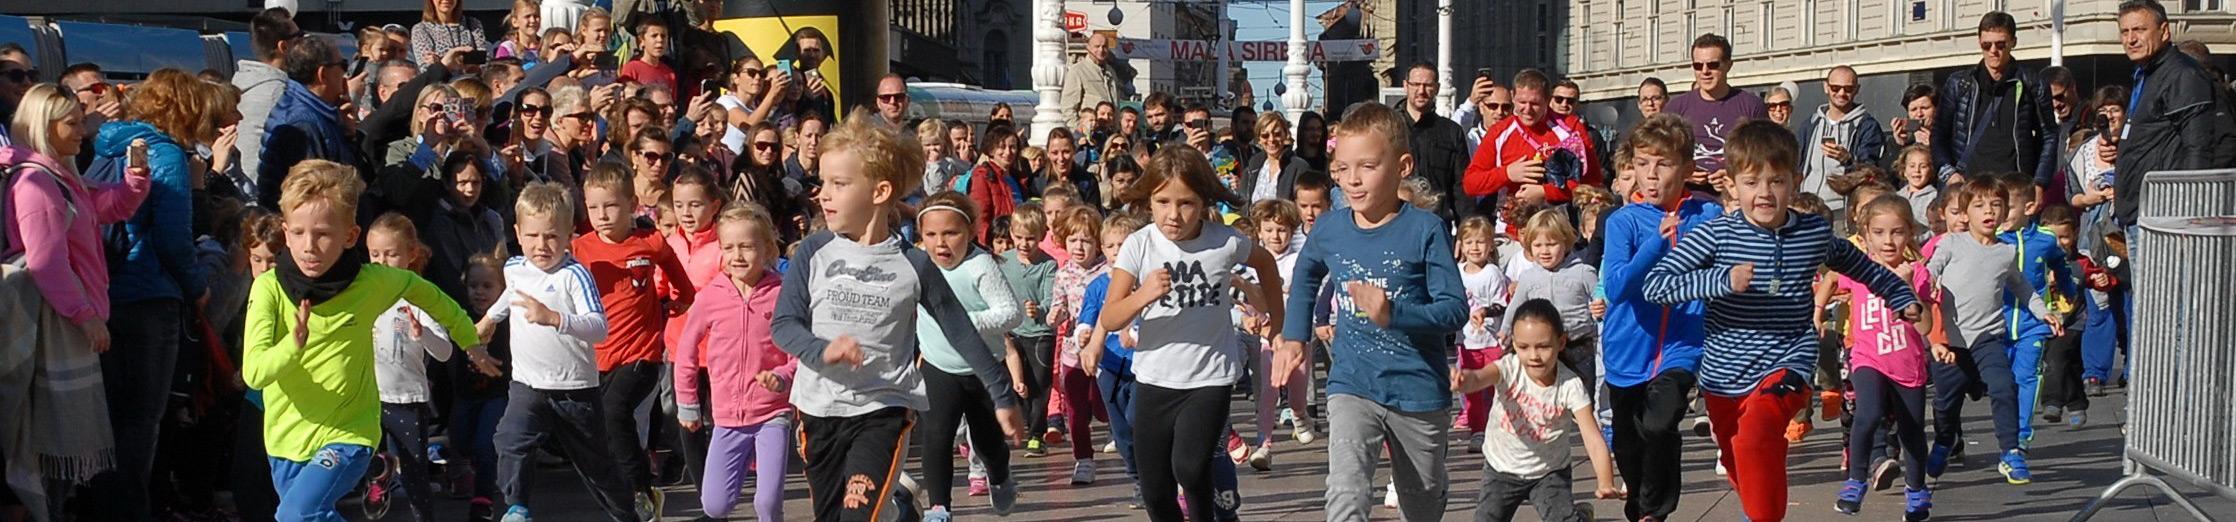 https://www.zagreb-marathon.com/wp-content/uploads/maraton05.jpg